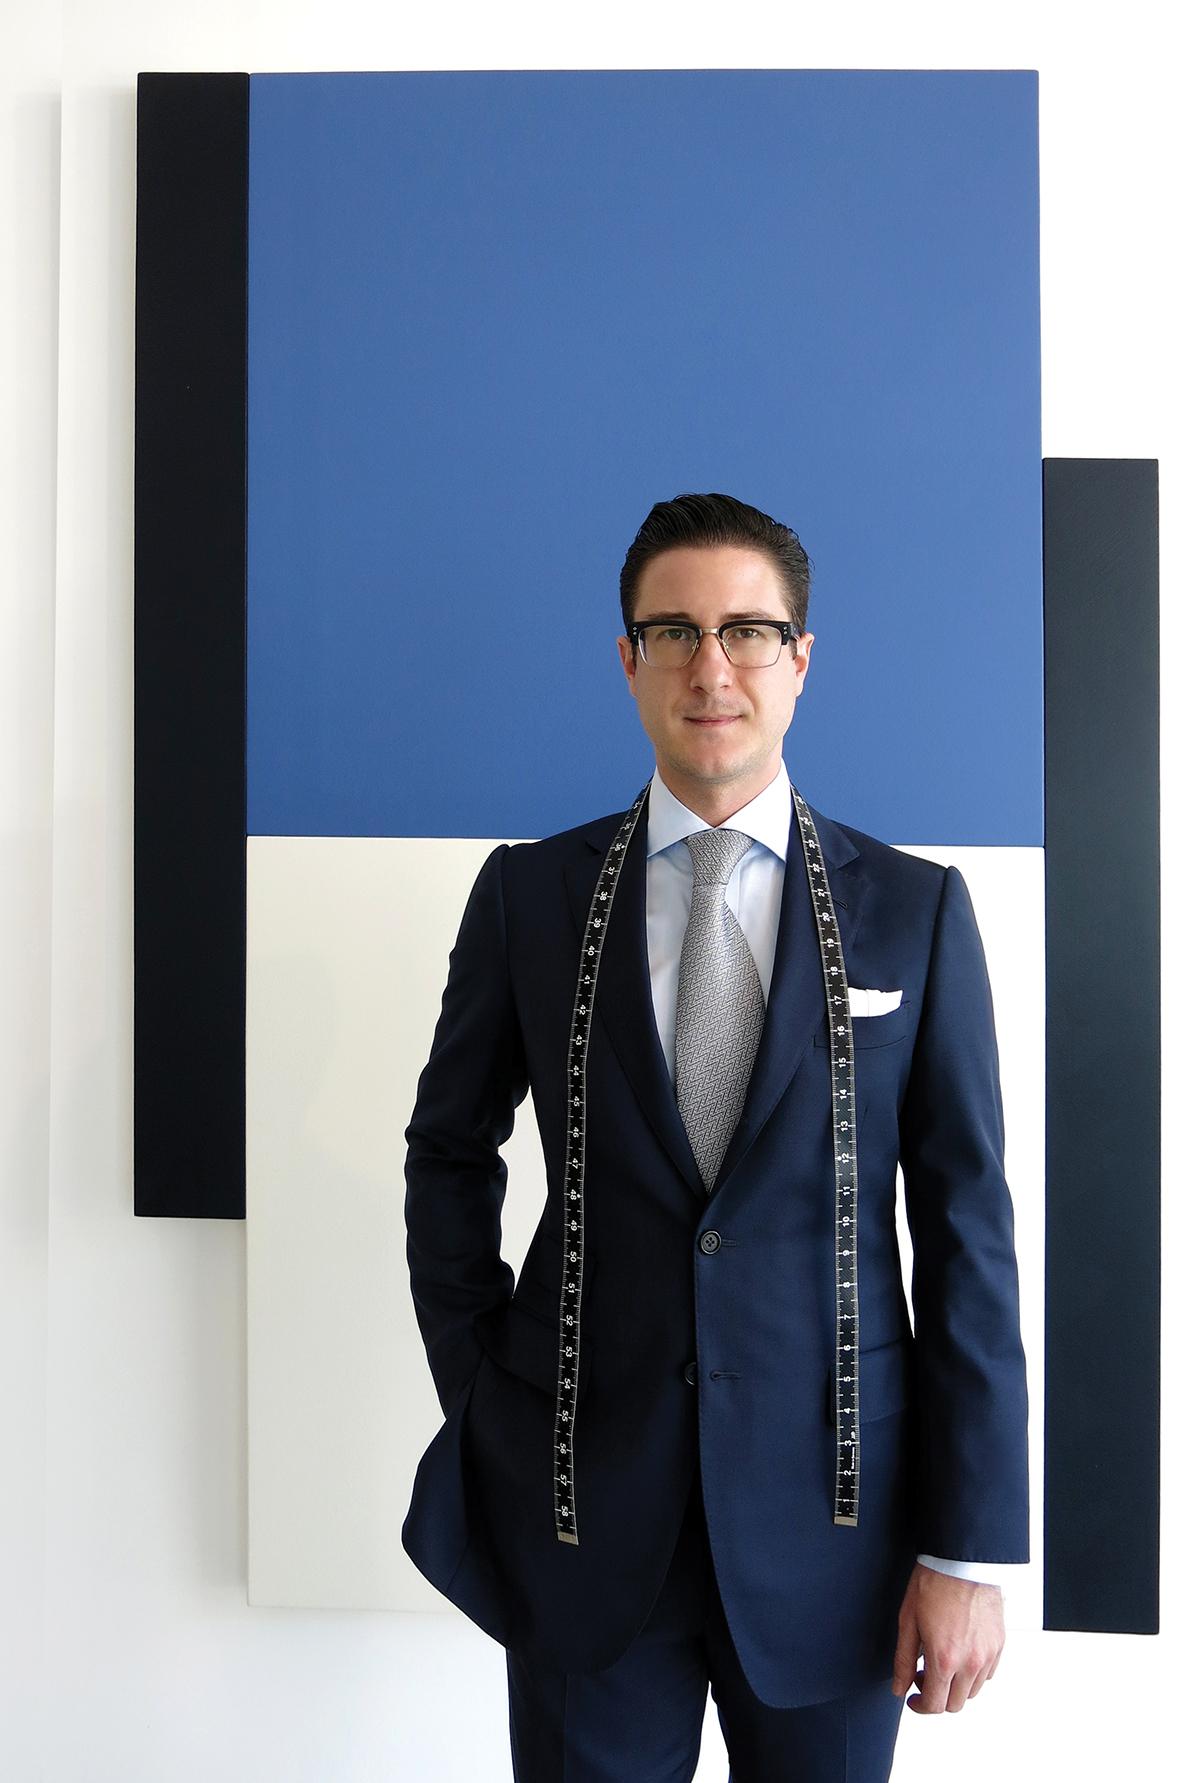 Artist & Gentleman: Newport Beach menswear designer Mark Pomerantz